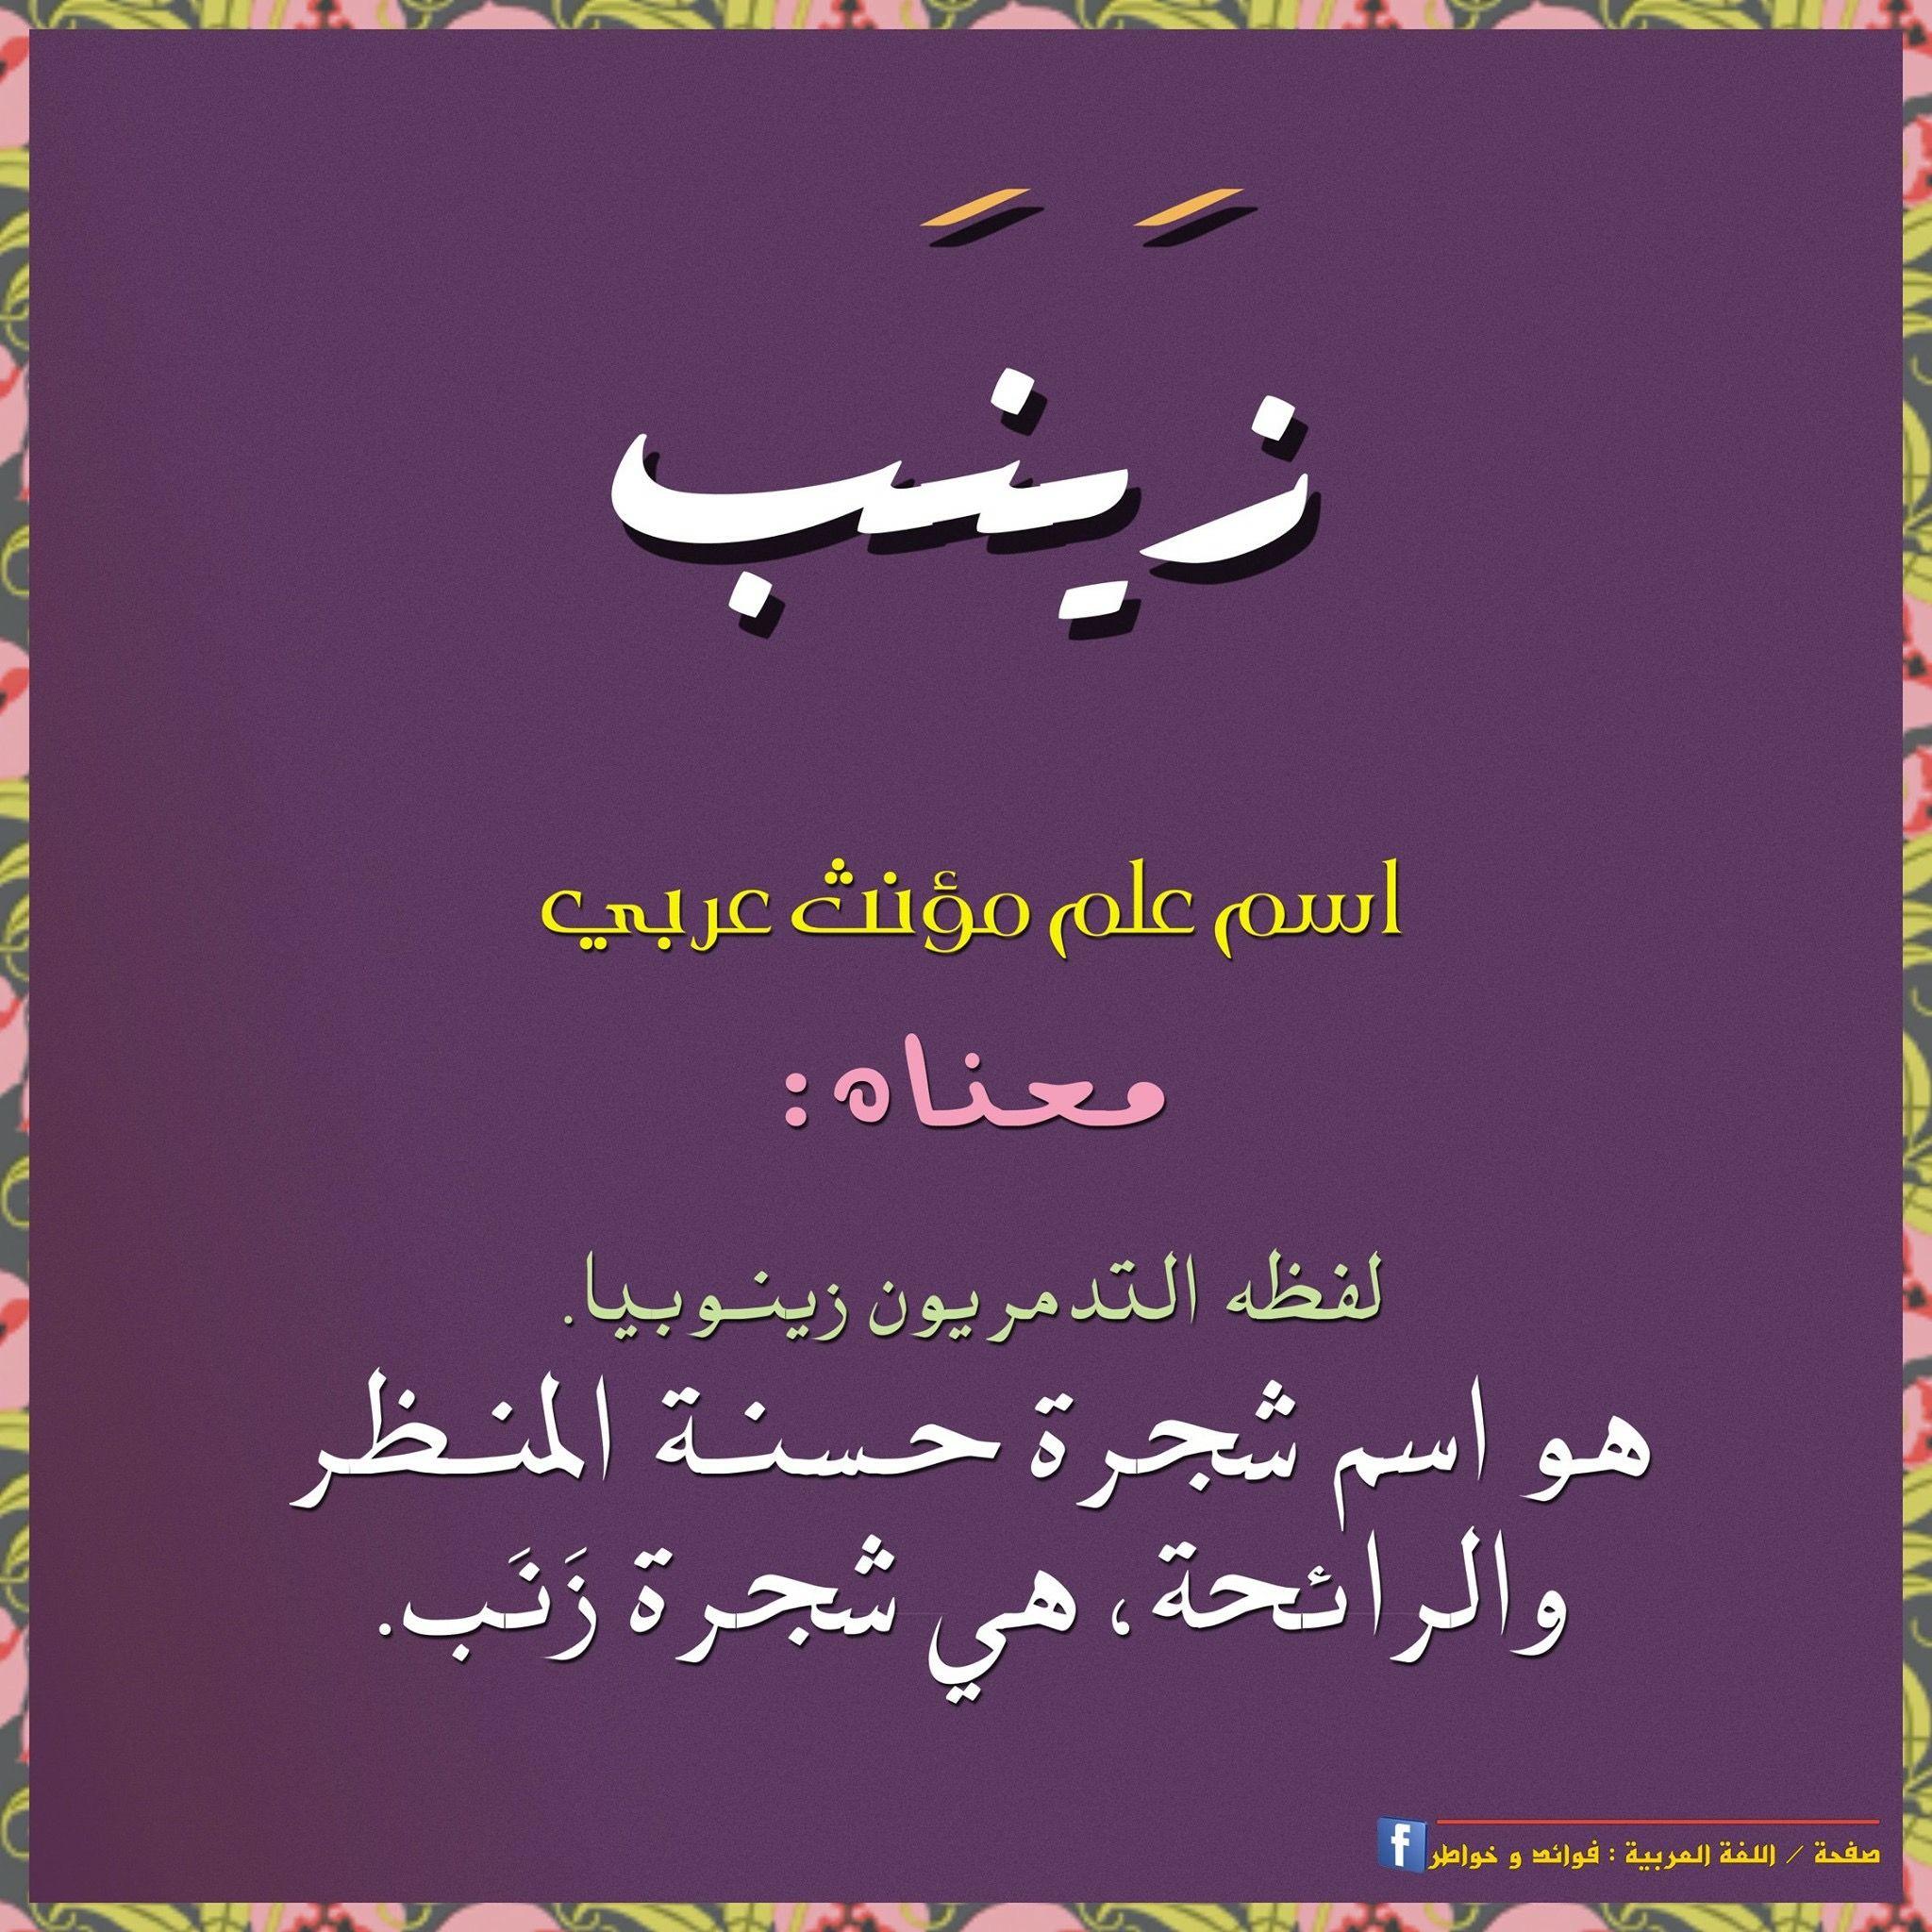 Pin By Medo Tarik On العربية Cool Words Learning Arabic Arabic Language